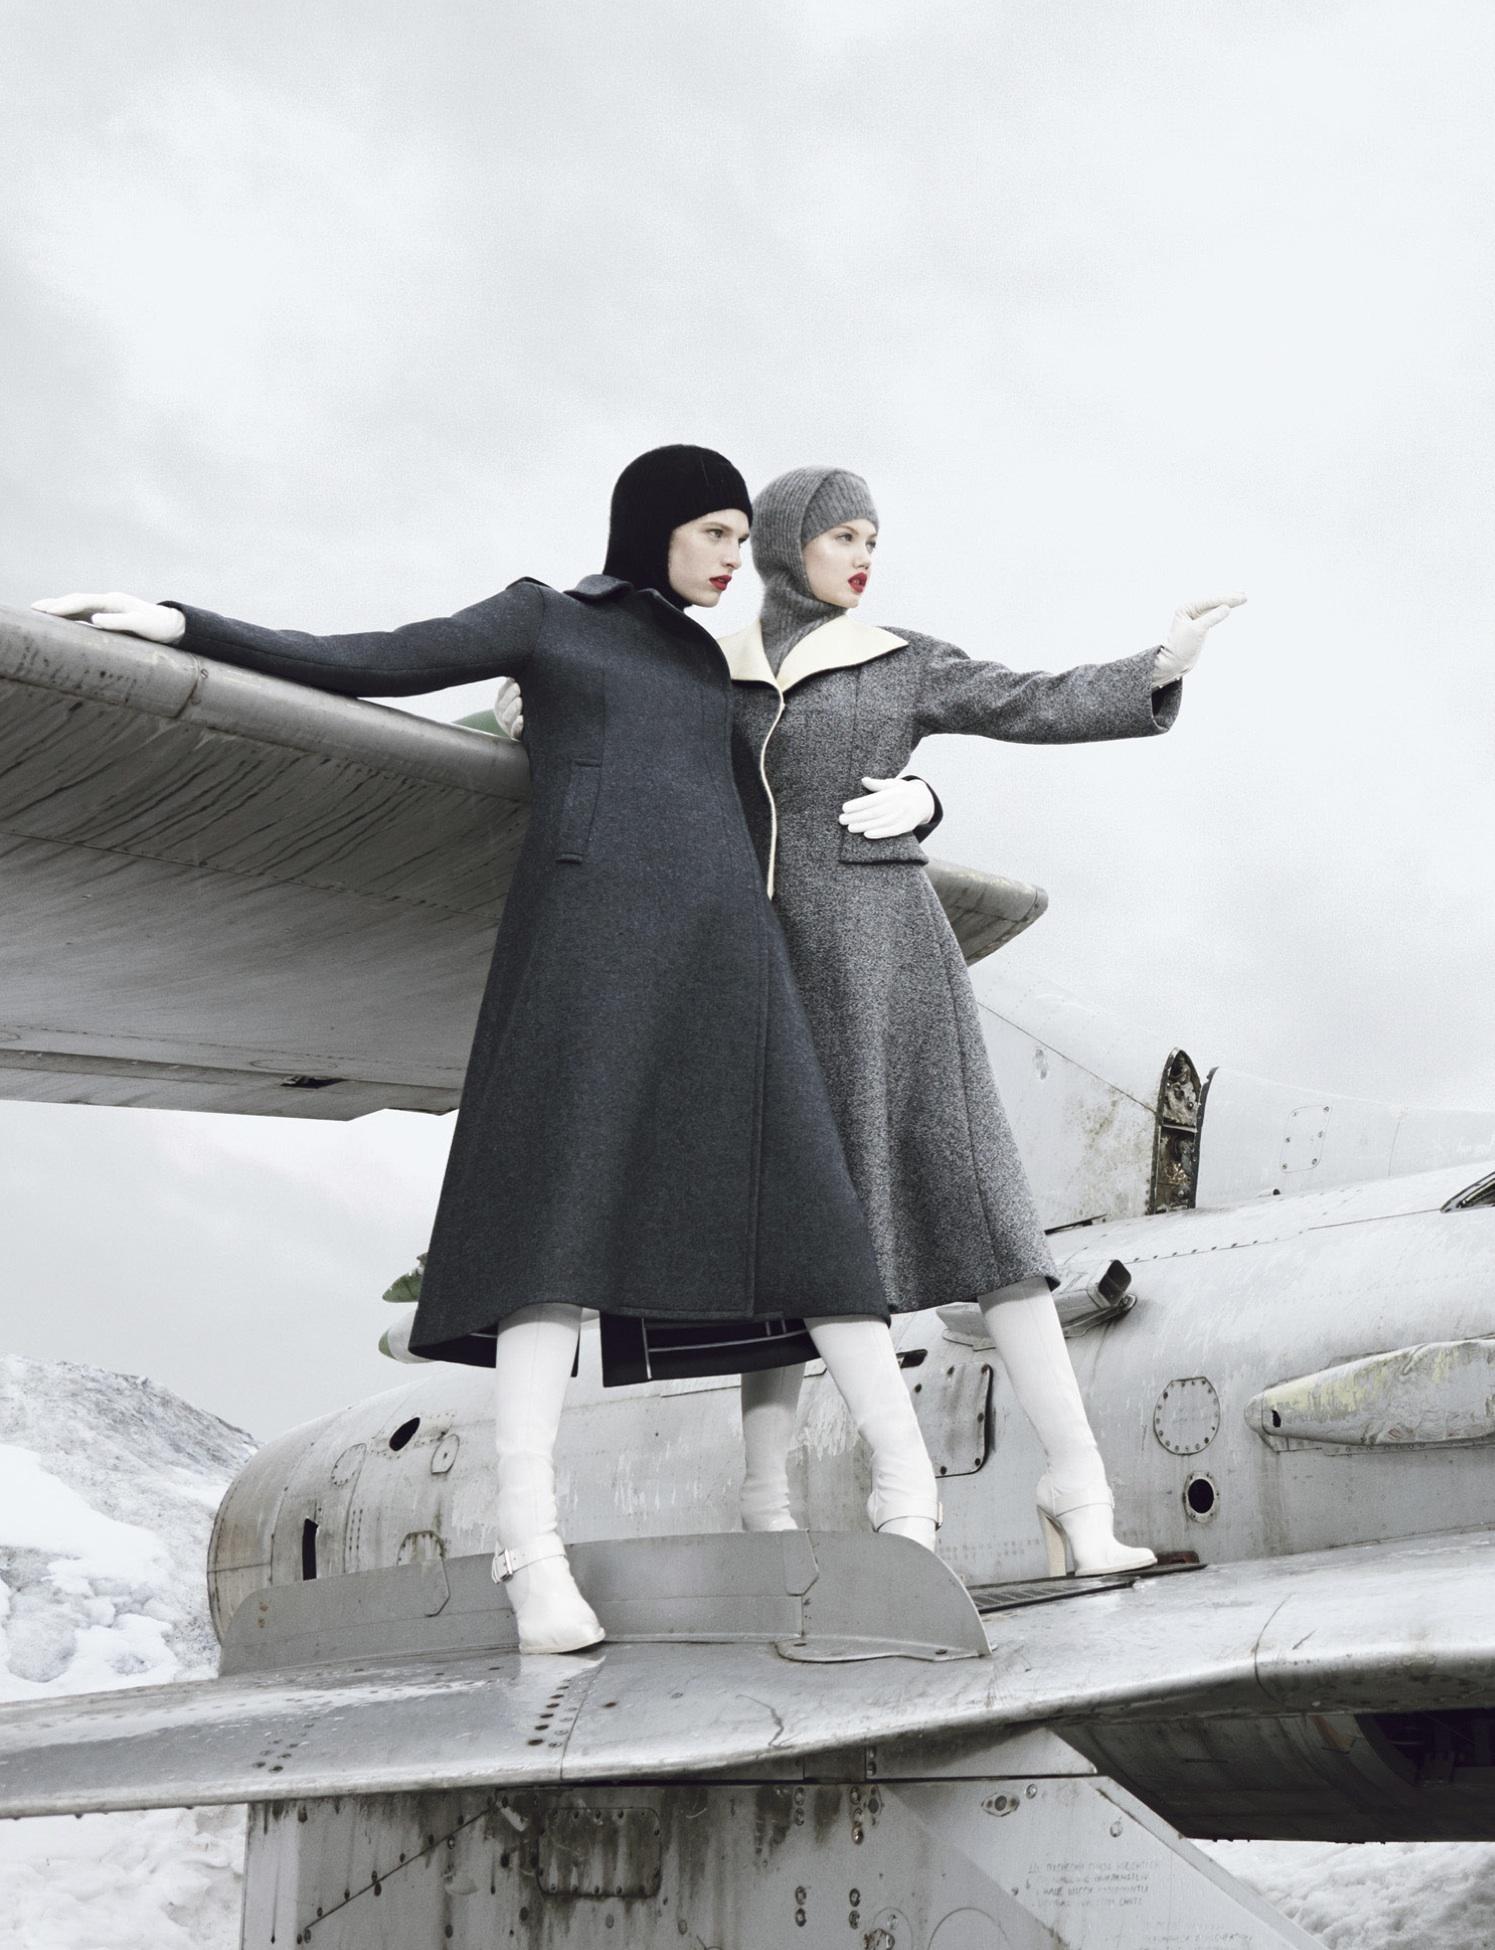 Giovanna-Battaglia-6-Super-Fly-W-Magazine-Emma-Summerton.jpg